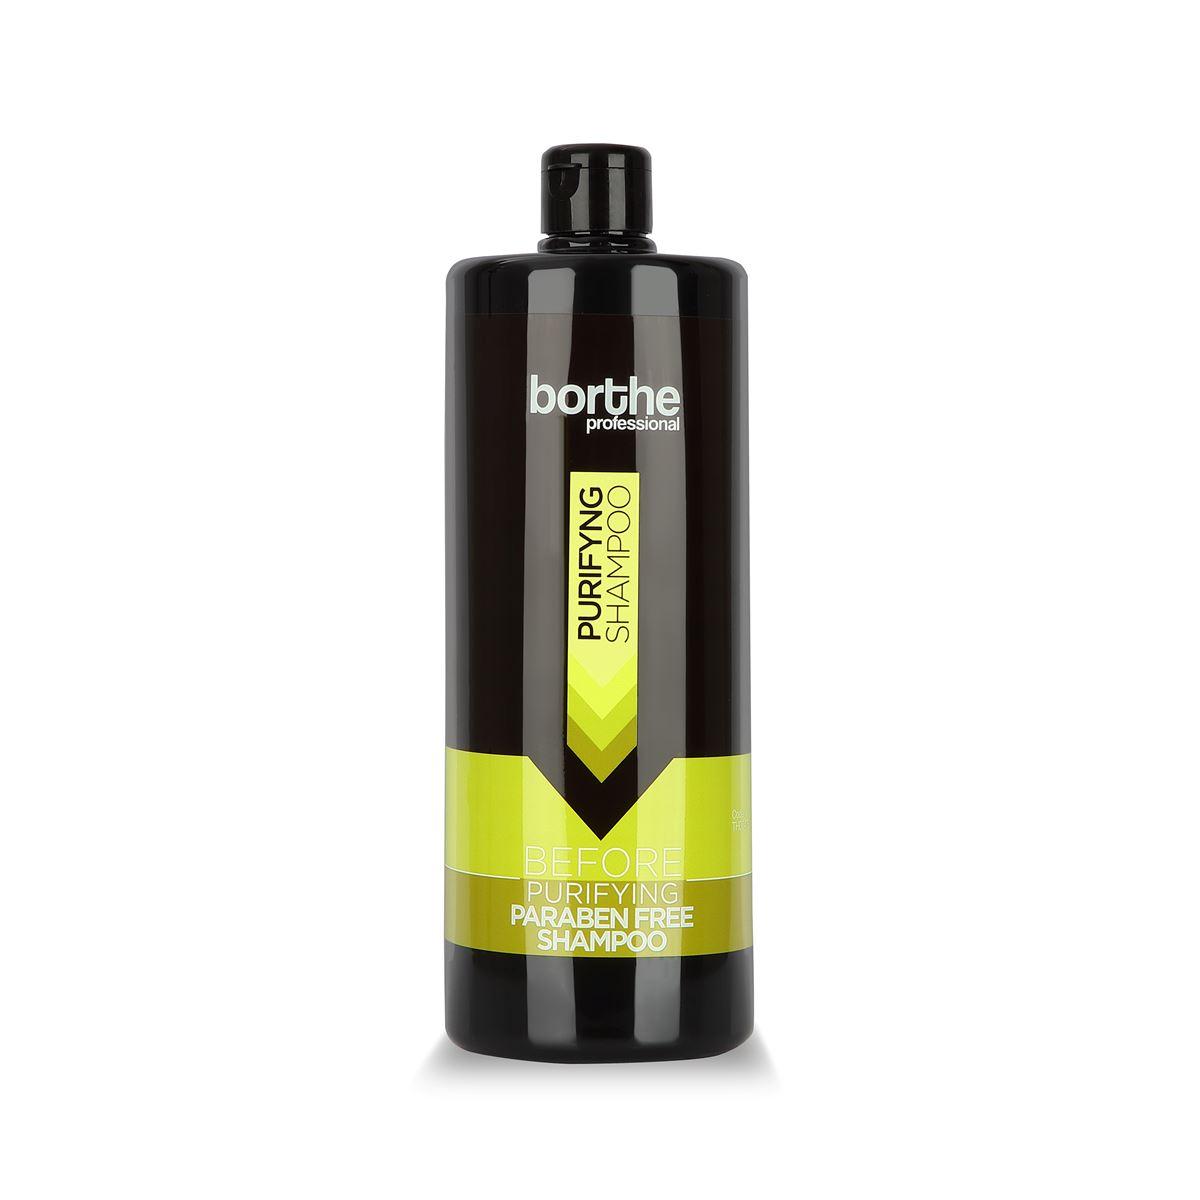 Borthe Paraben Free Before Shampoo 1100 ml.